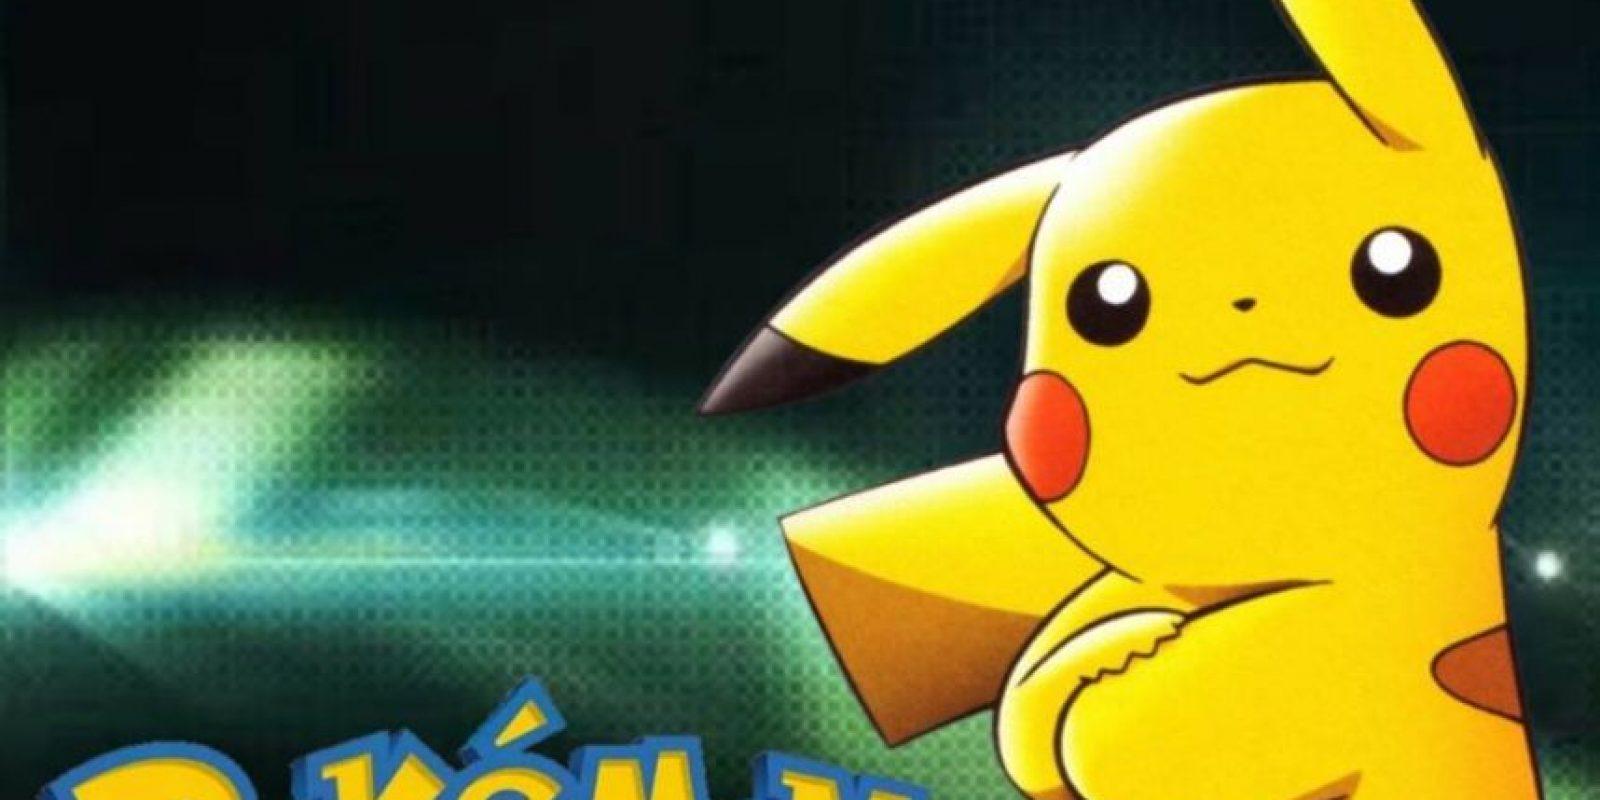 Foto:vía Facebook Pokémon Go Puerto Rico. Imagen Por: